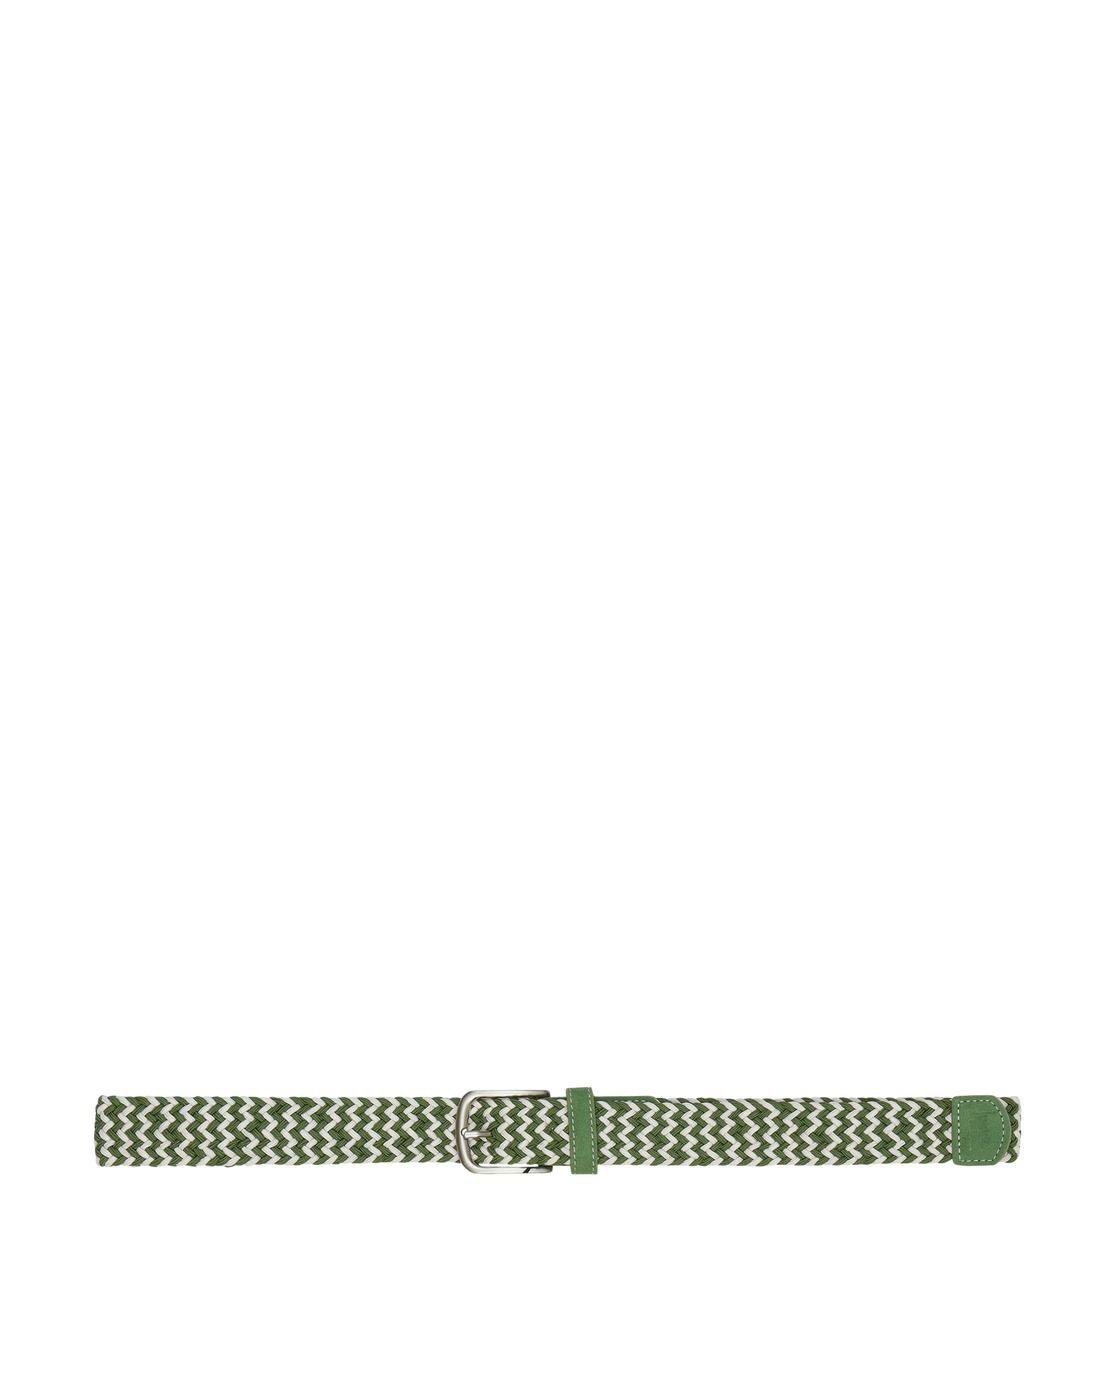 Photo: Stussy Woven Cord Belt Green